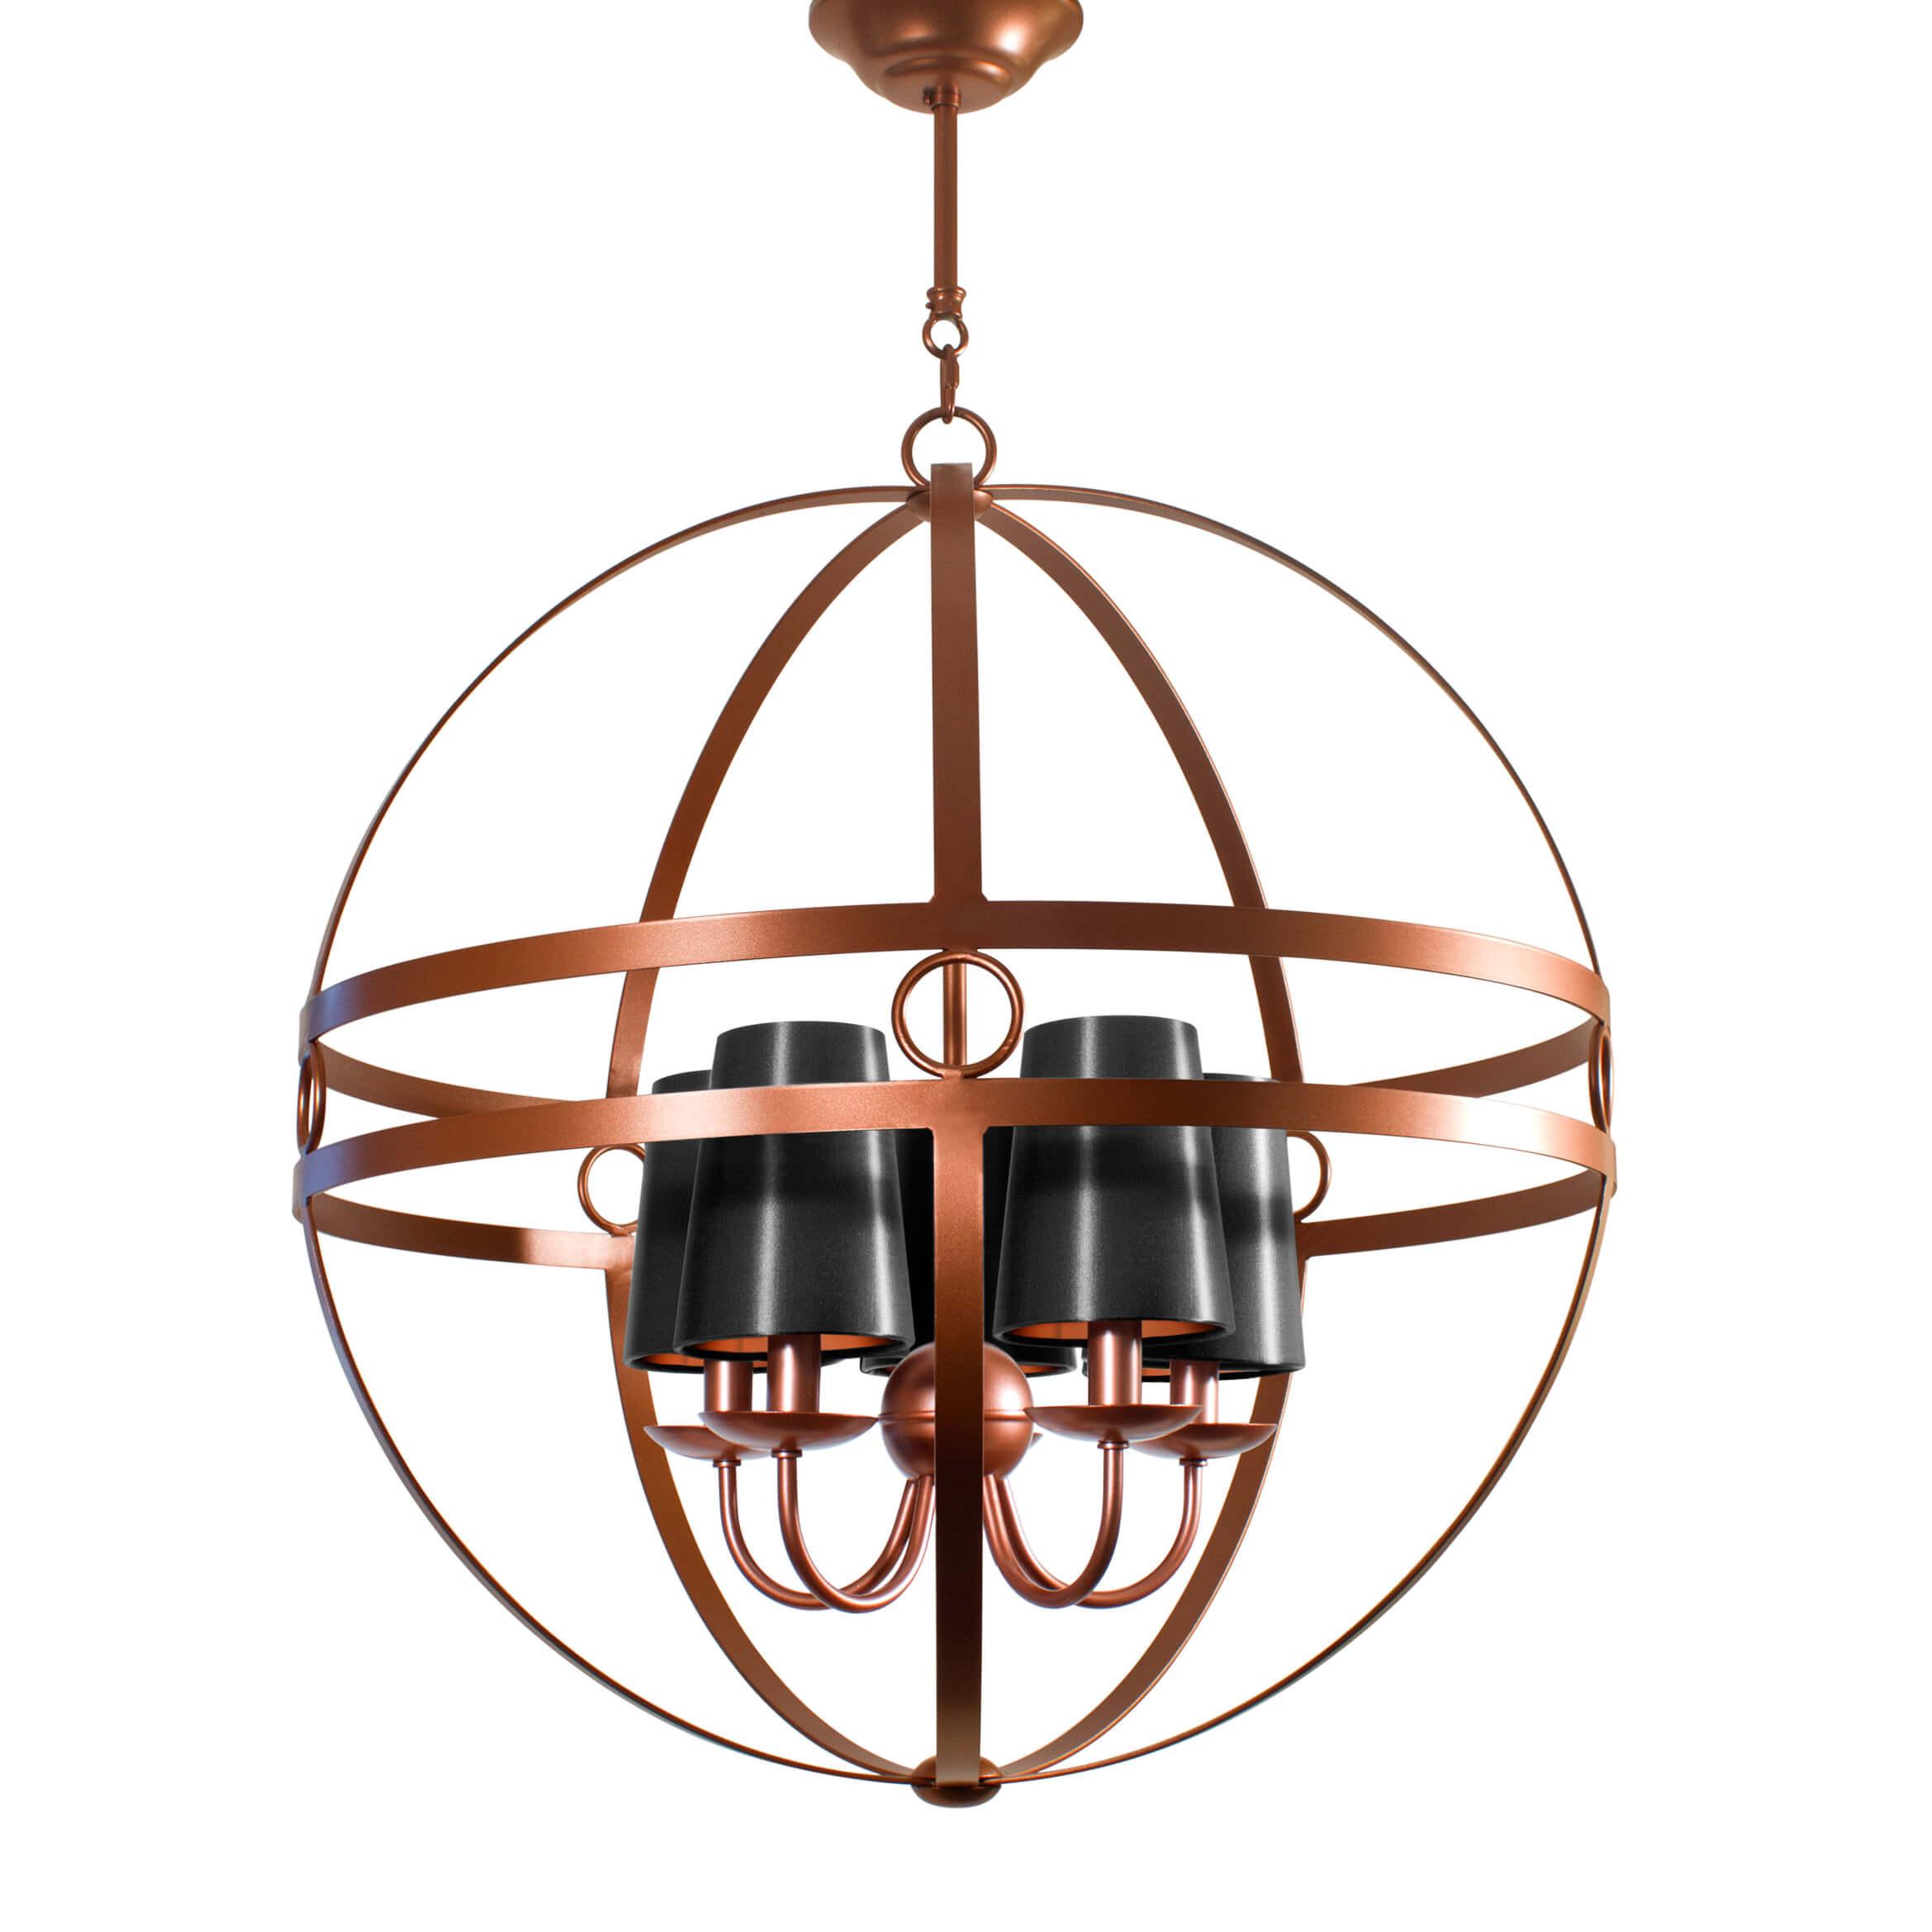 Mondo villaverde london villaverde london mondo copper metal chandelier square 1 arubaitofo Images